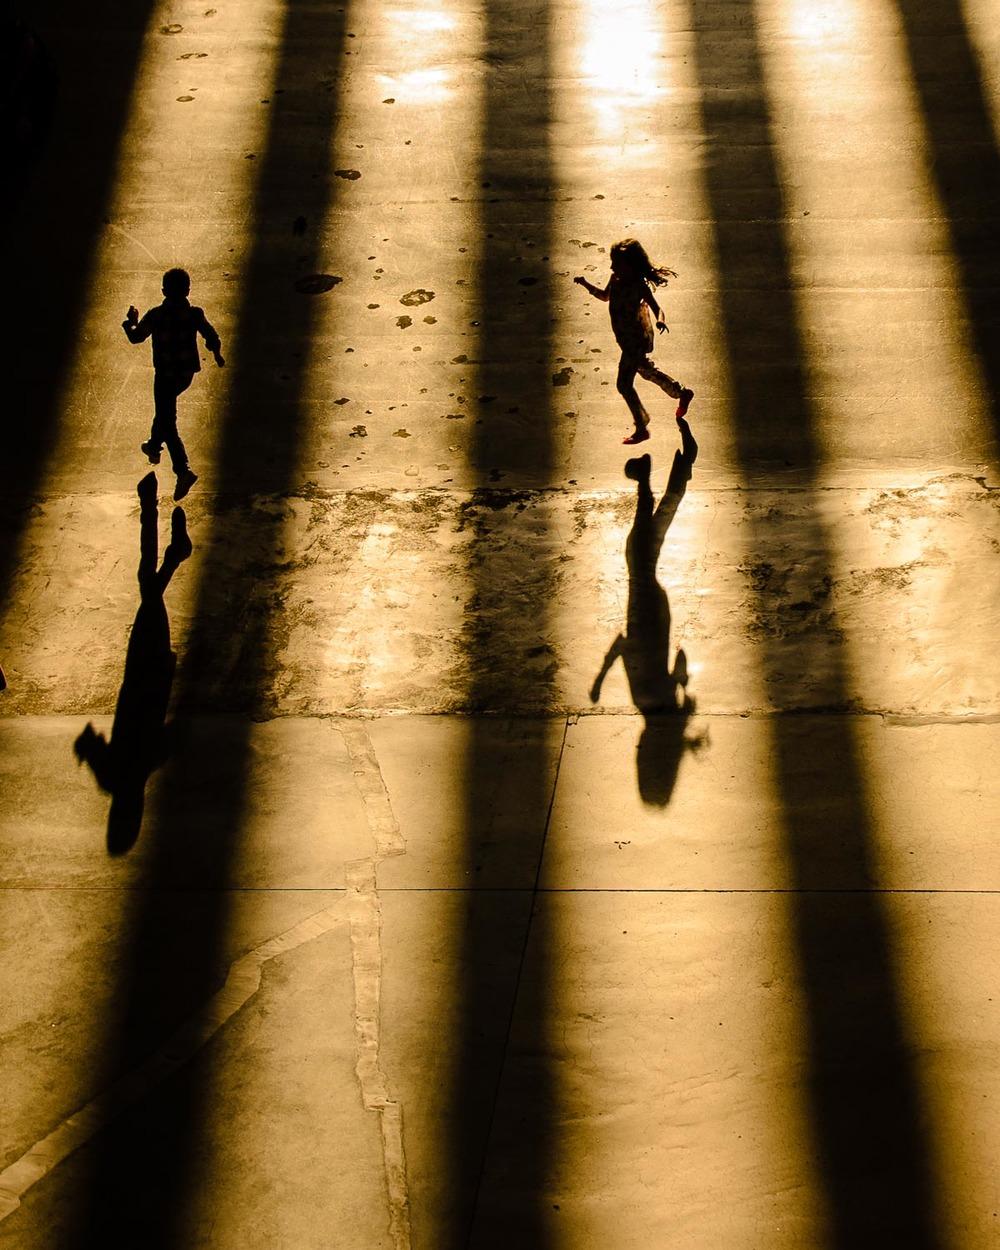 Shadowplay, Tate Modern Turbine Hall